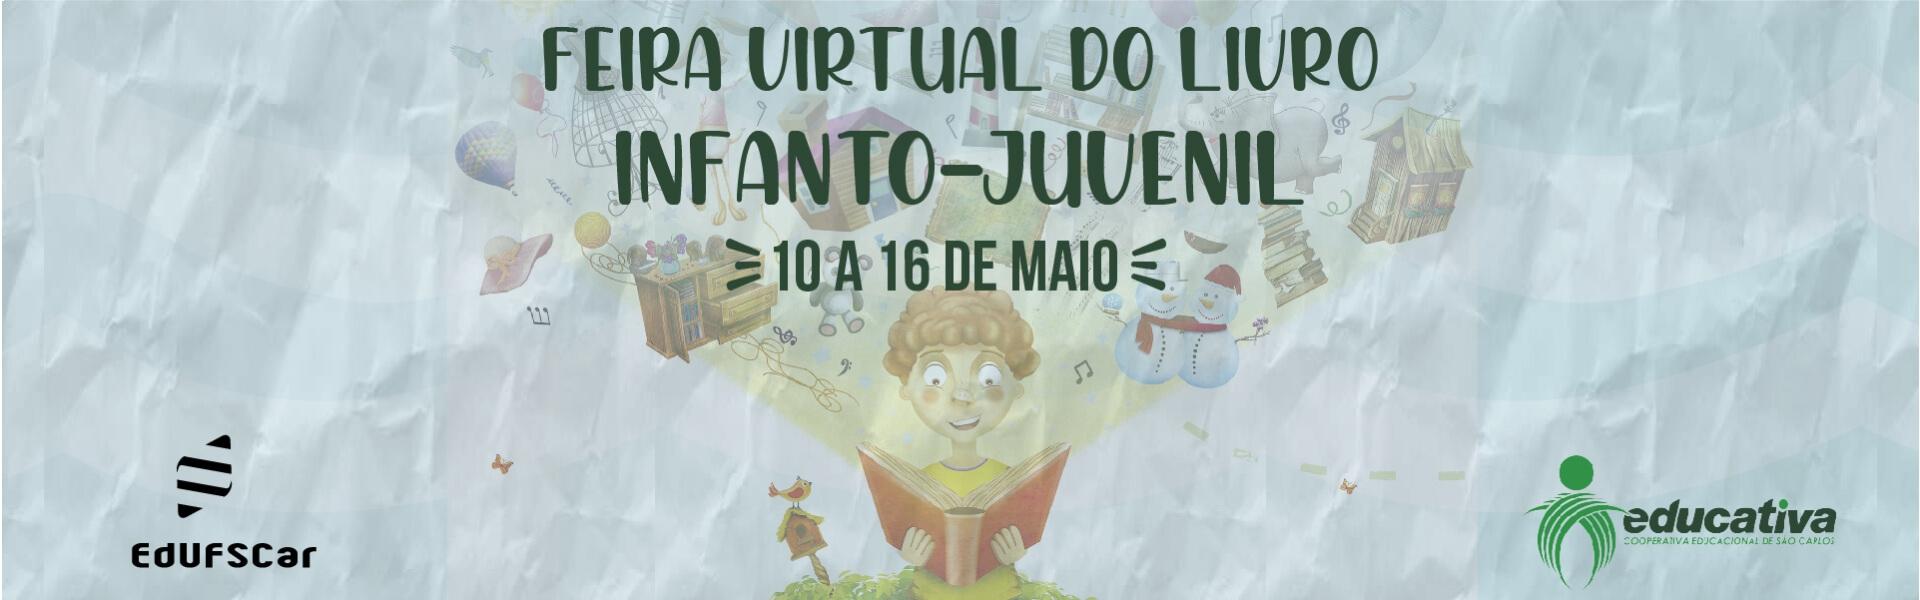 Feira virtual do livro infanto-juvenil